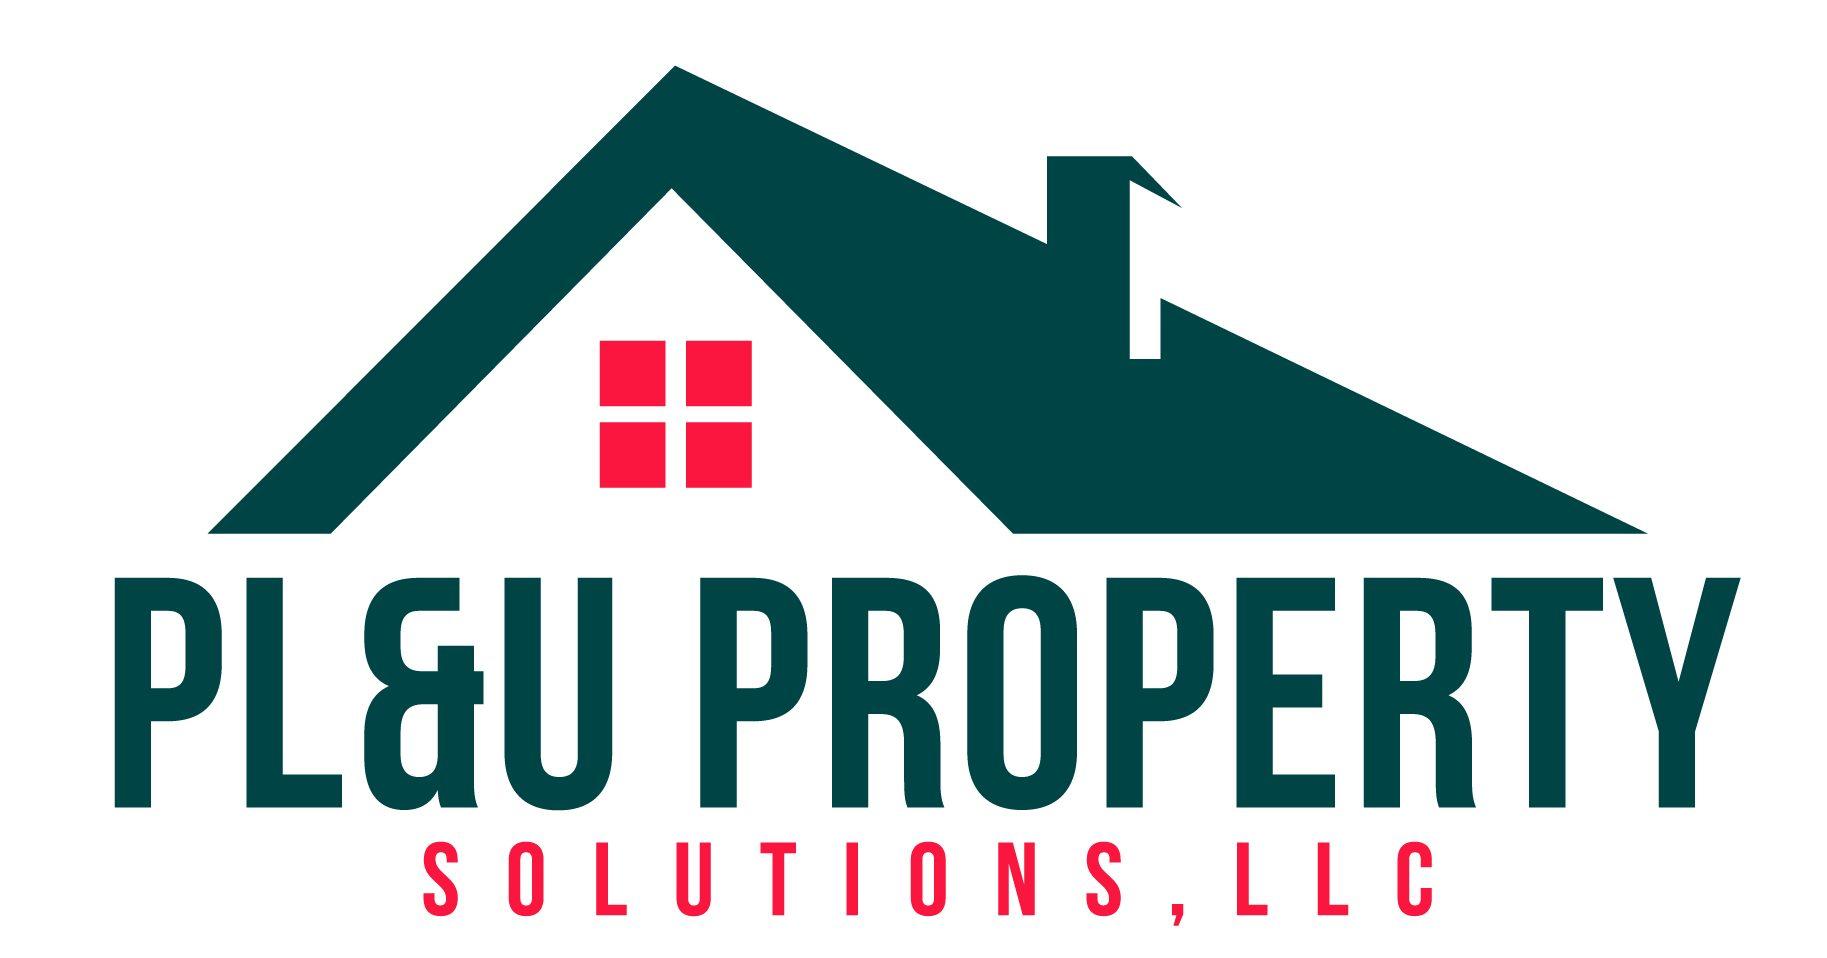 PL&U Property Solutions, LLC